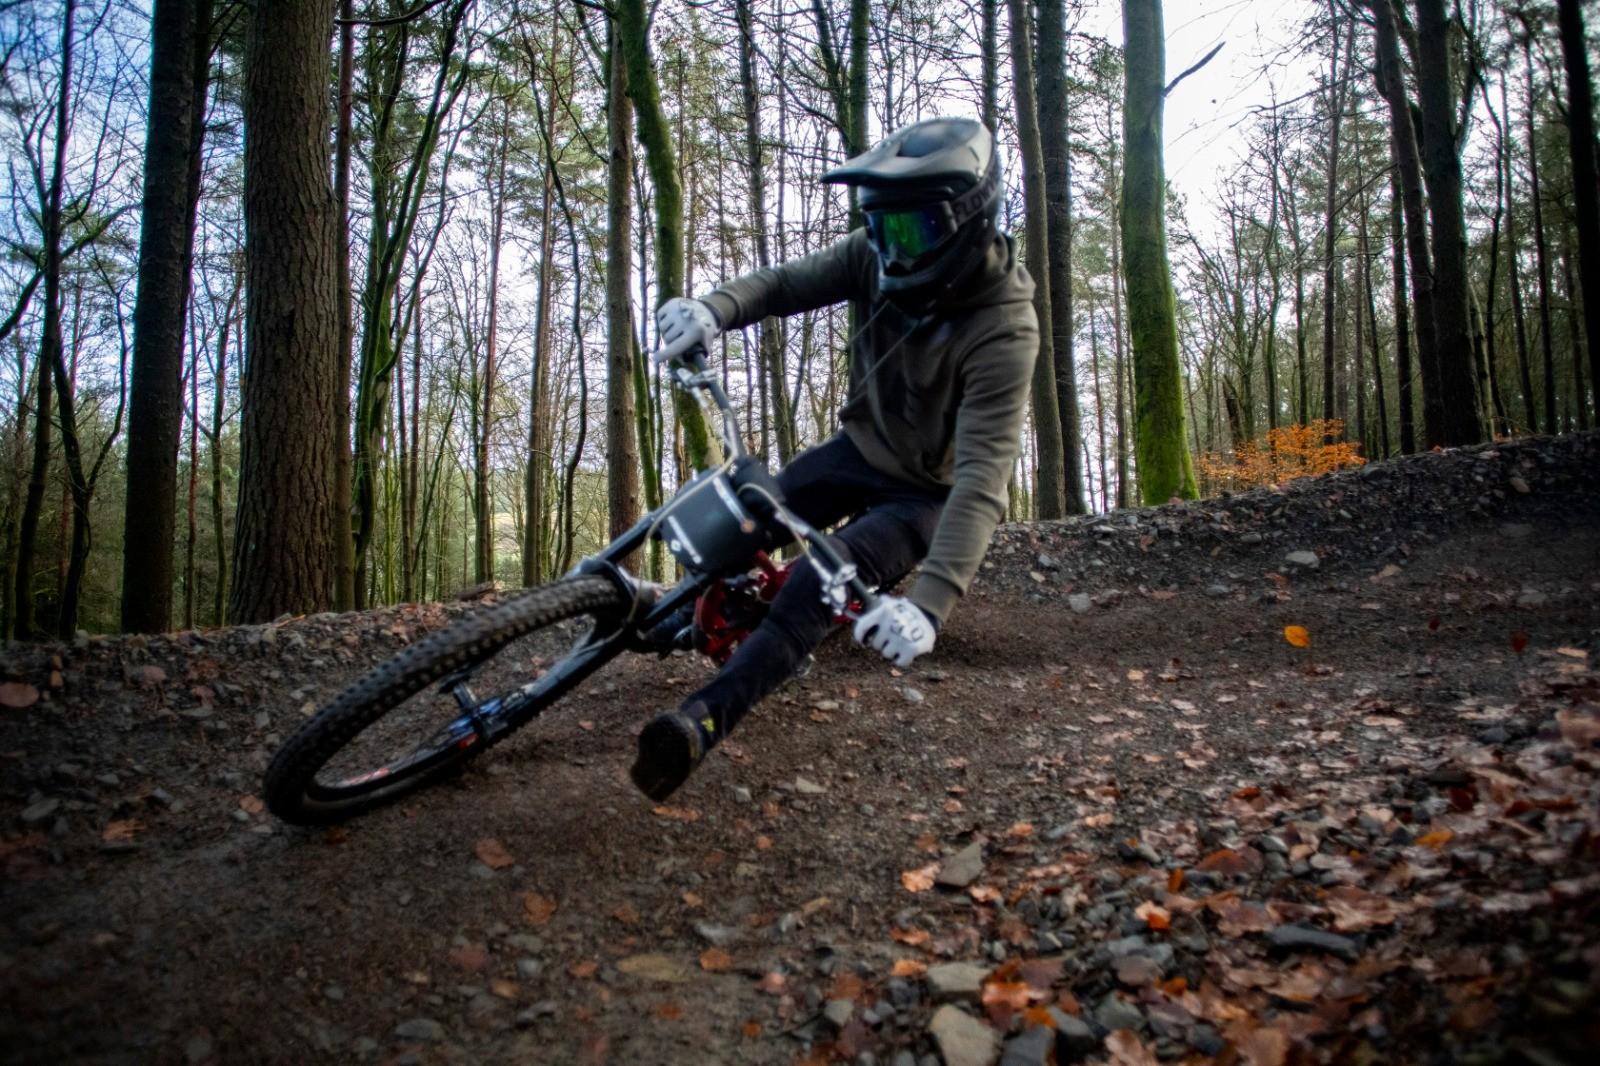 FD51B10F-871B-44BE-980F-0338E441EC74 - martin dunn - Mountain Biking Pictures - Vital MTB